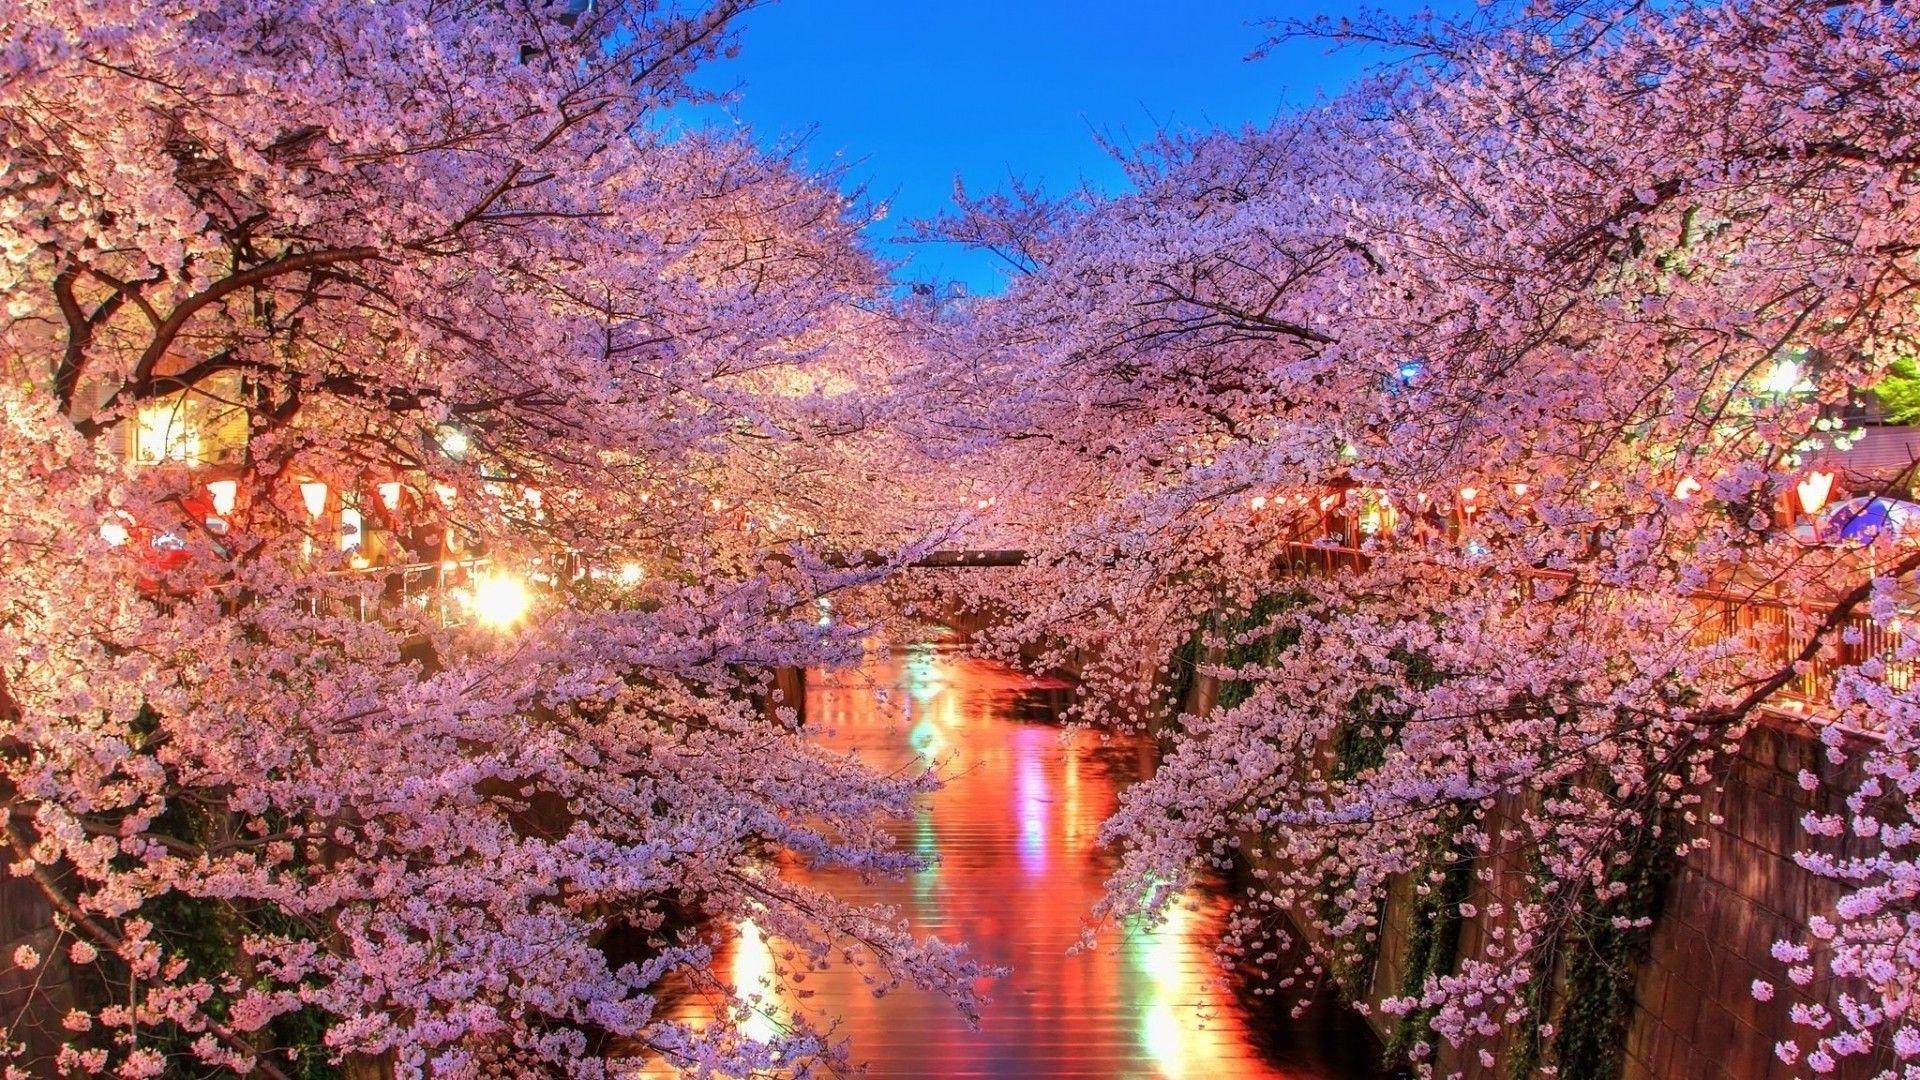 japanese cherry blossom wallpaper 1080p wallpaper | green thumb